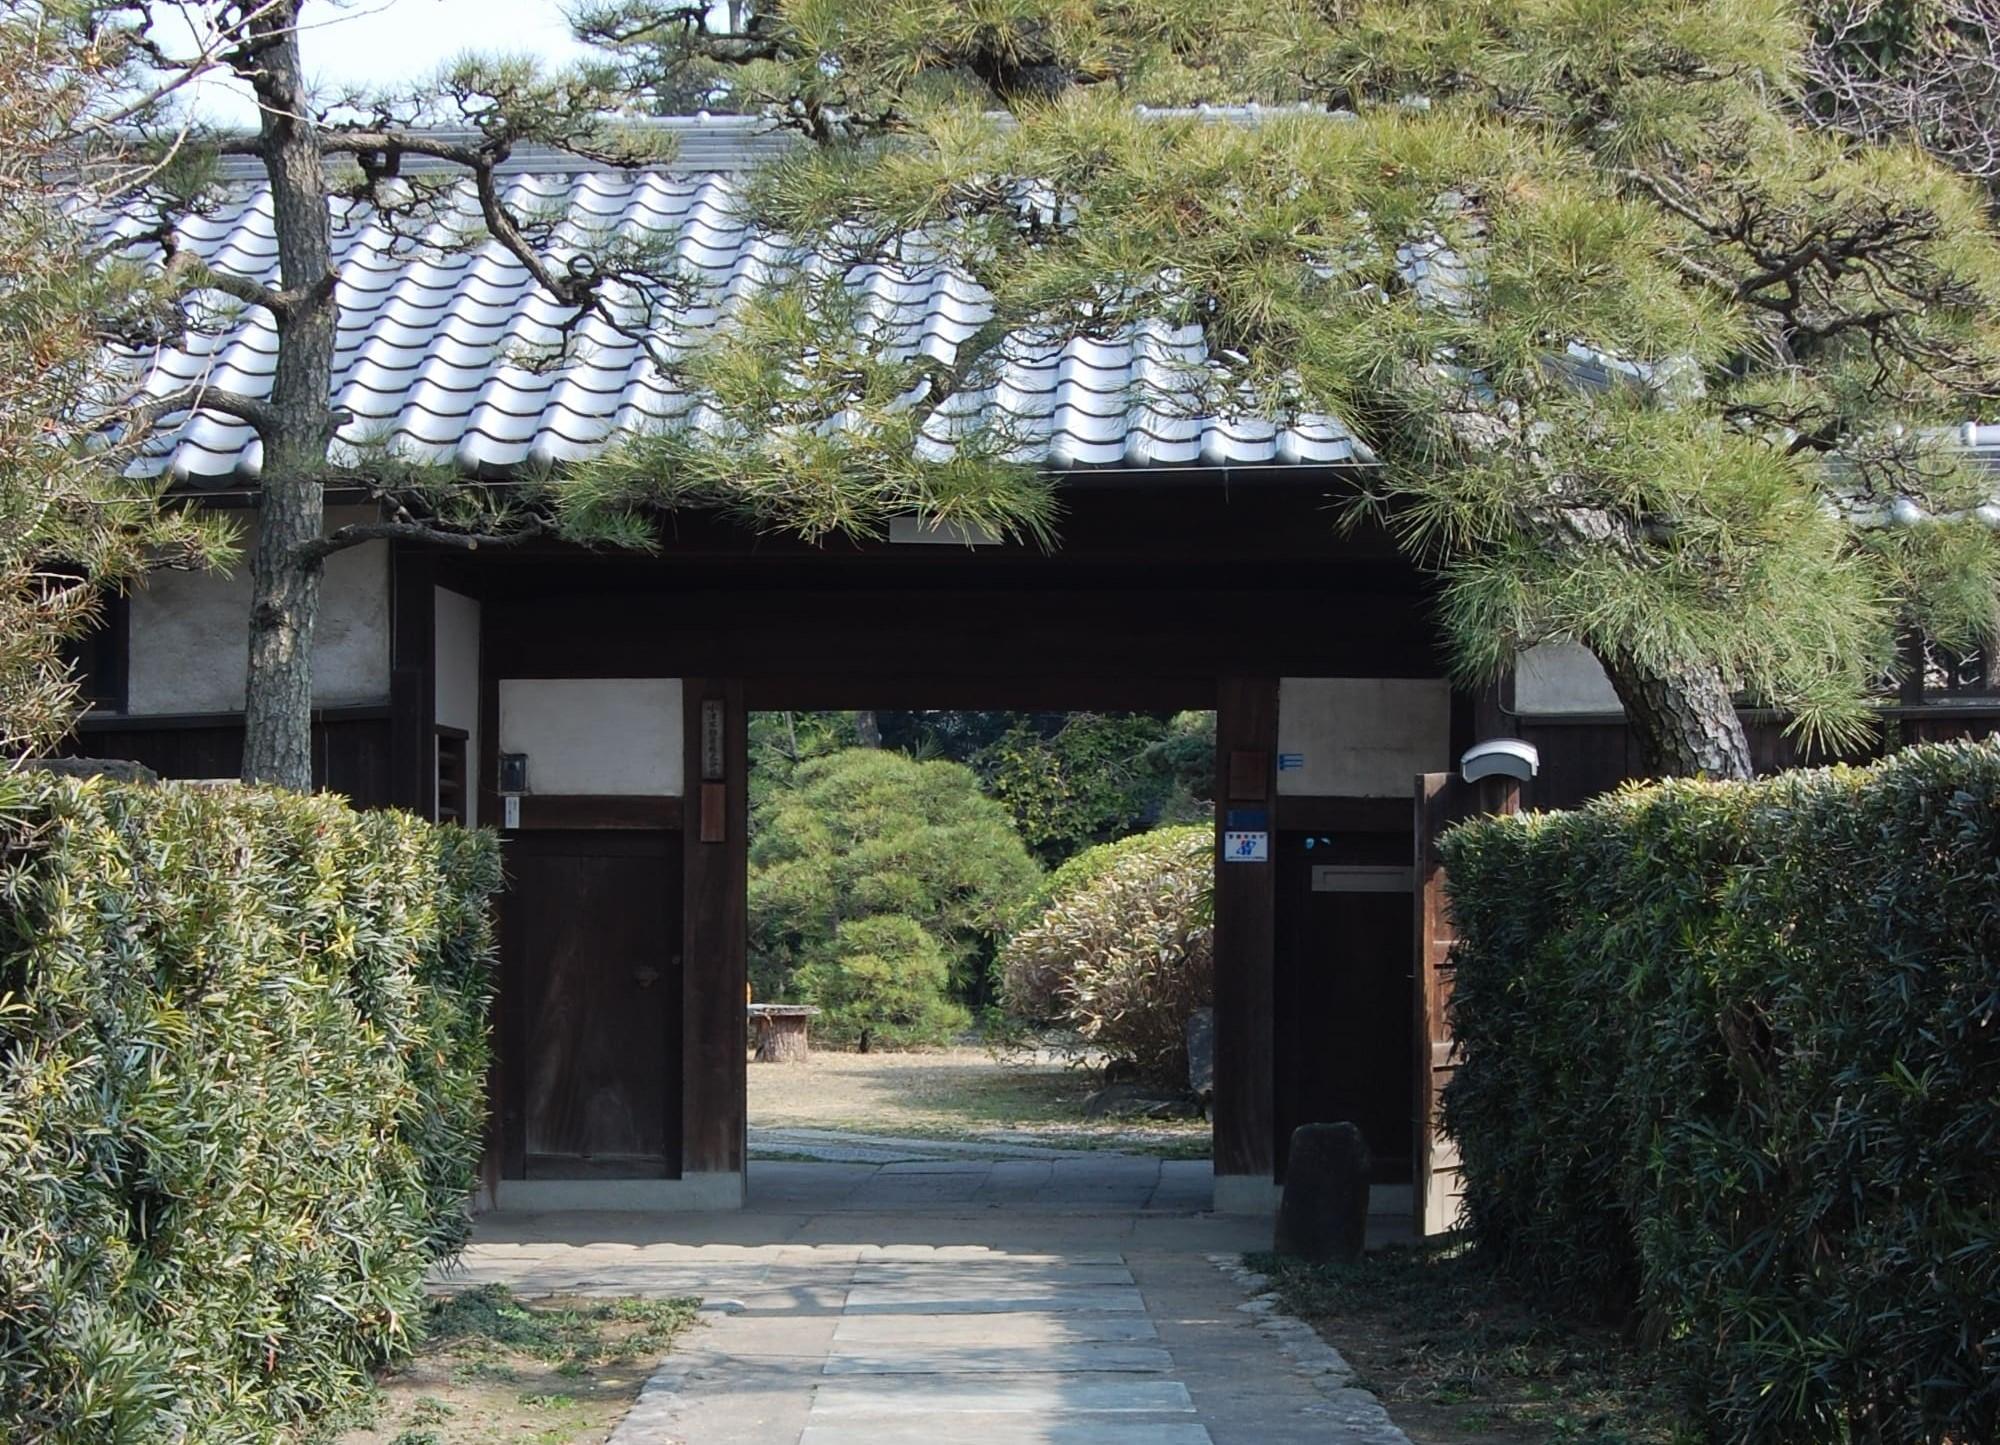 <p>勝手門及び納屋 </p>切妻造桟瓦葺で長屋門の形式